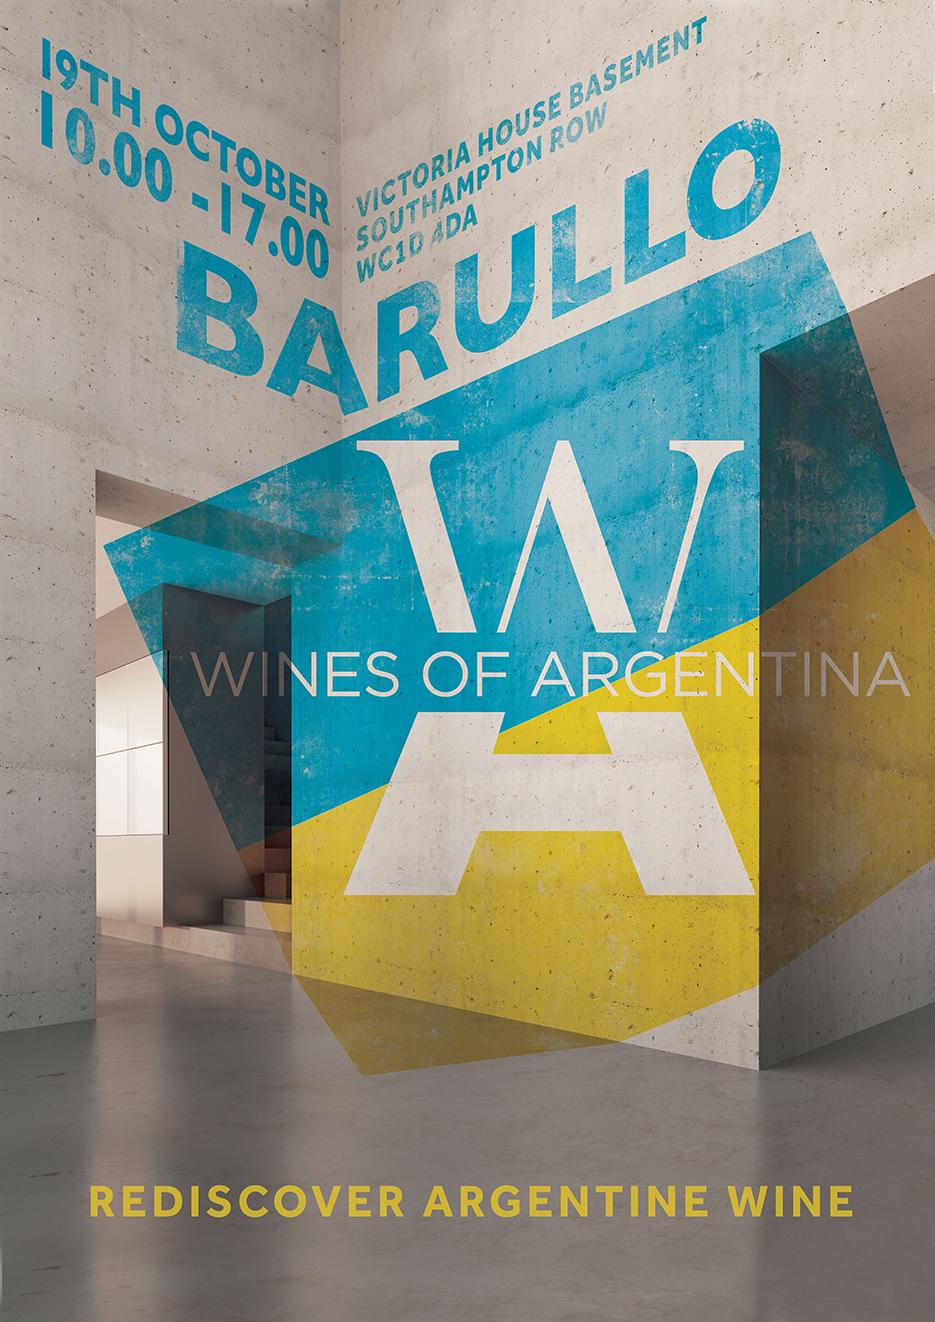 Barullo - Wine of Argentina 025.jpg